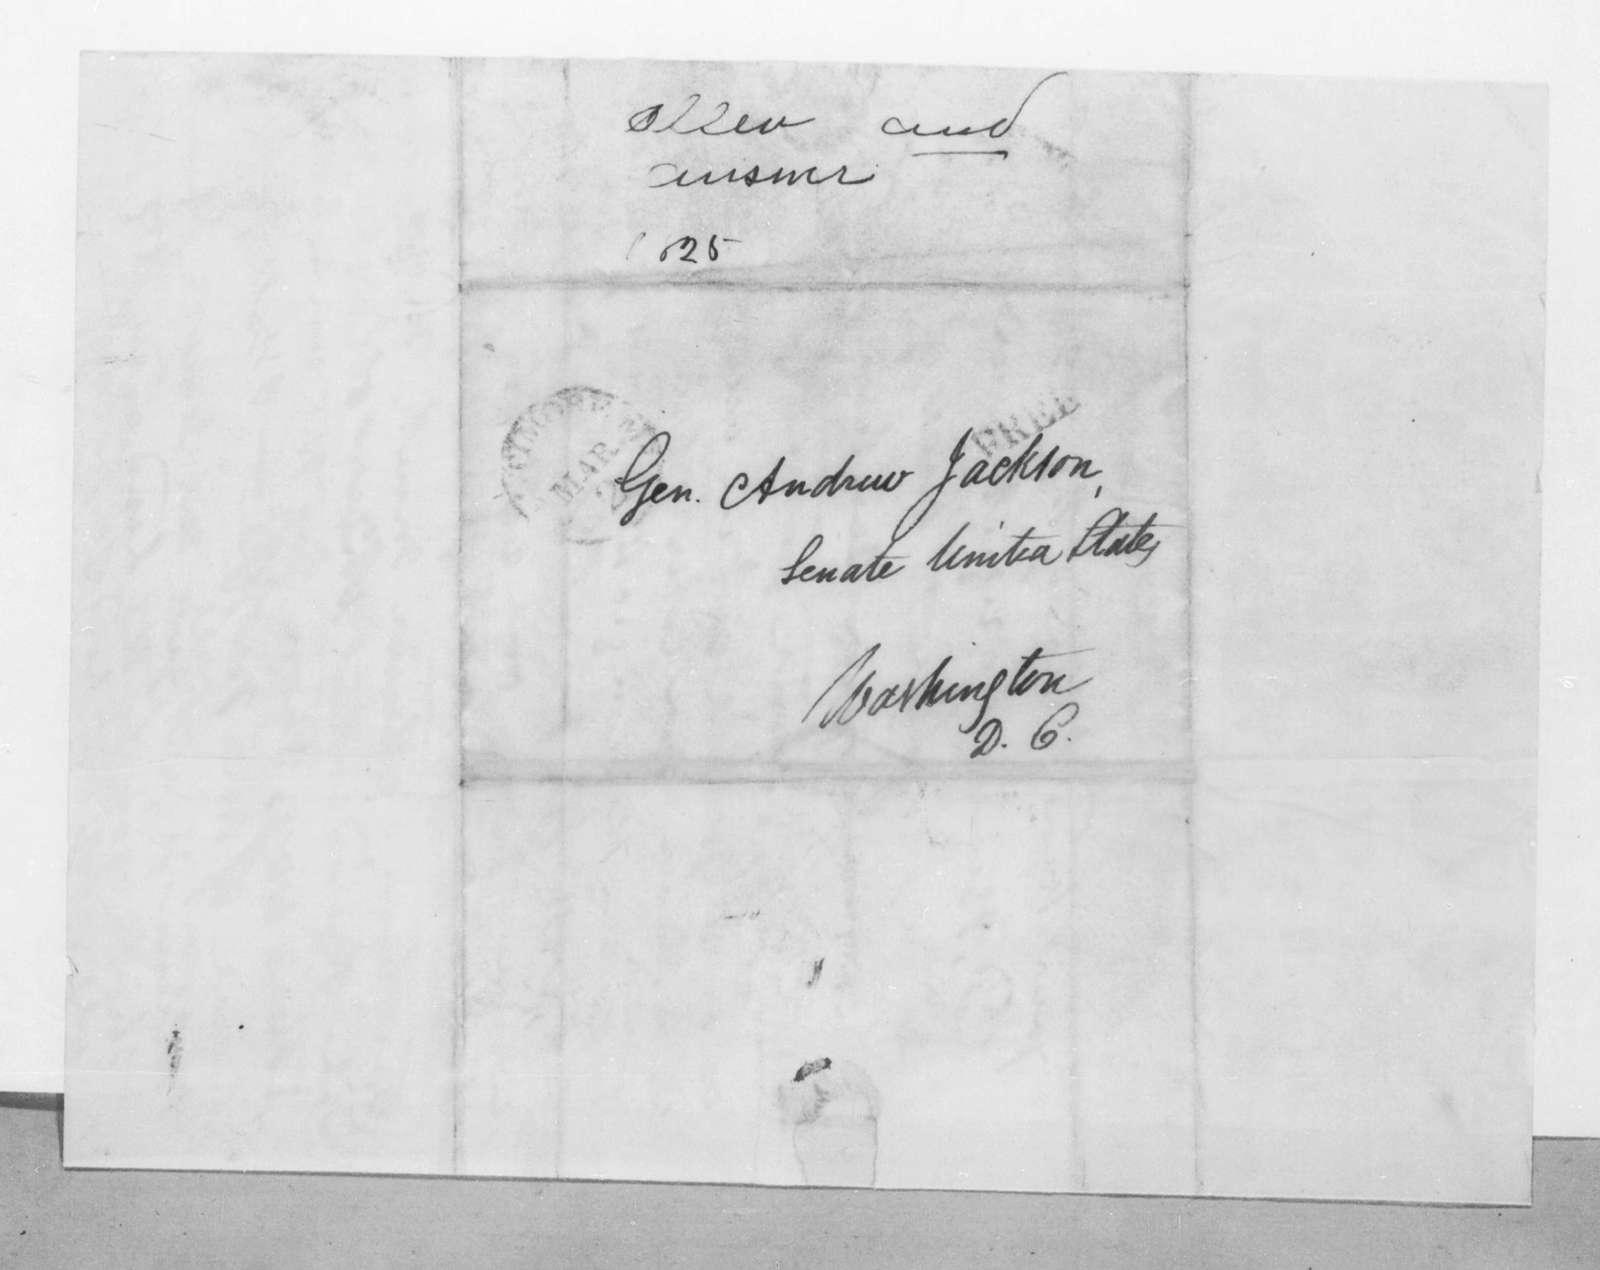 Paul Allen to Andrew Jackson, March 1, 1825